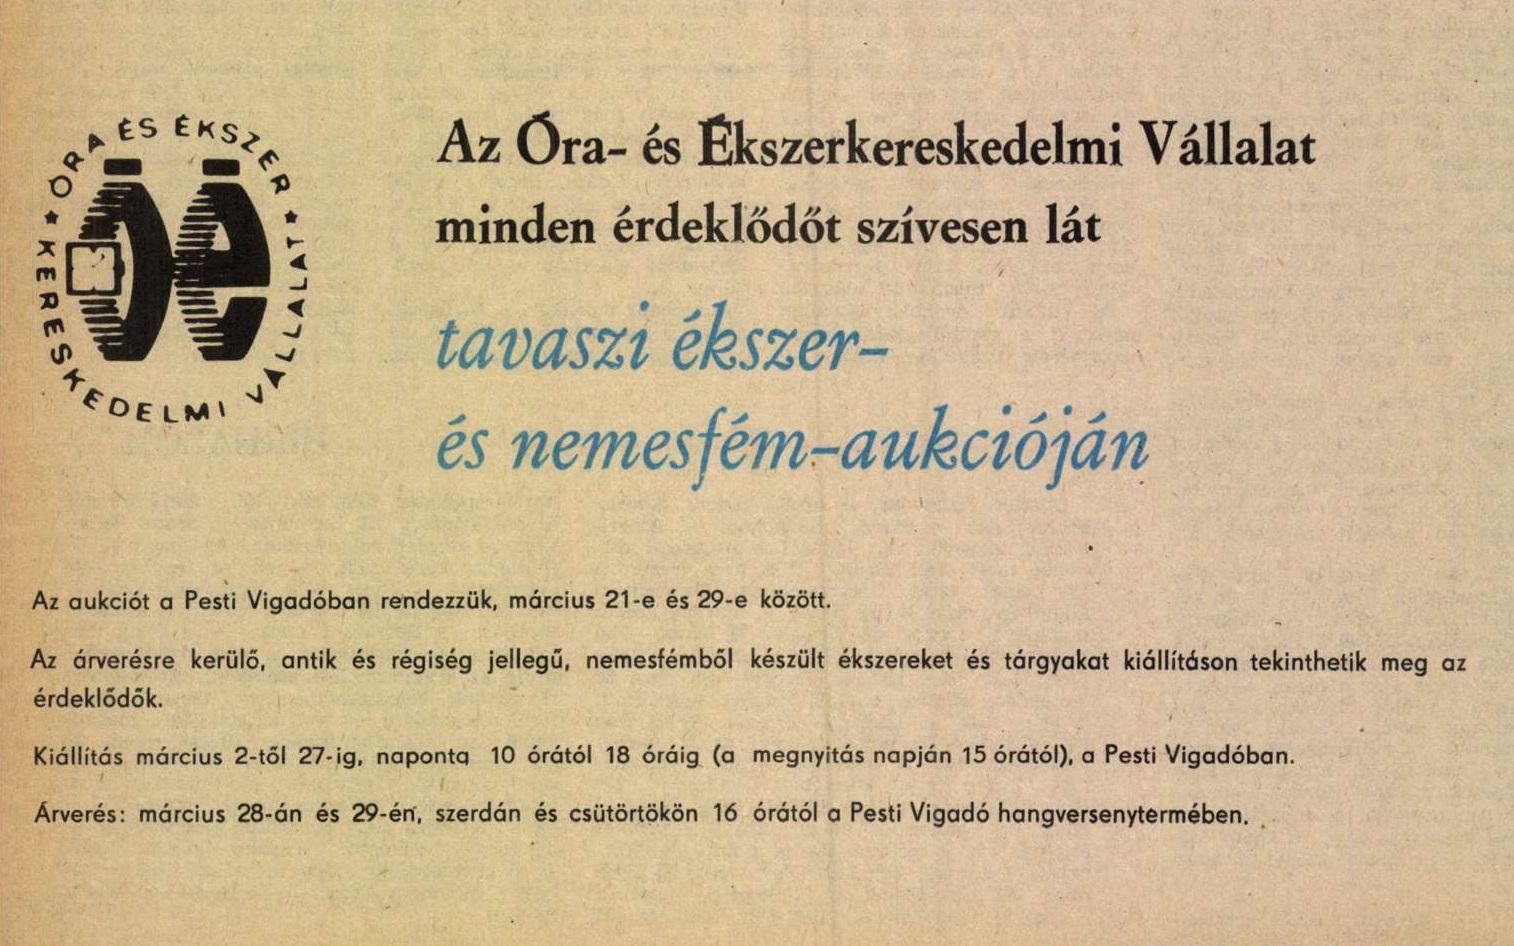 idokapszula_nb_i_1983_84_17_fordulo_reklam_1.jpg